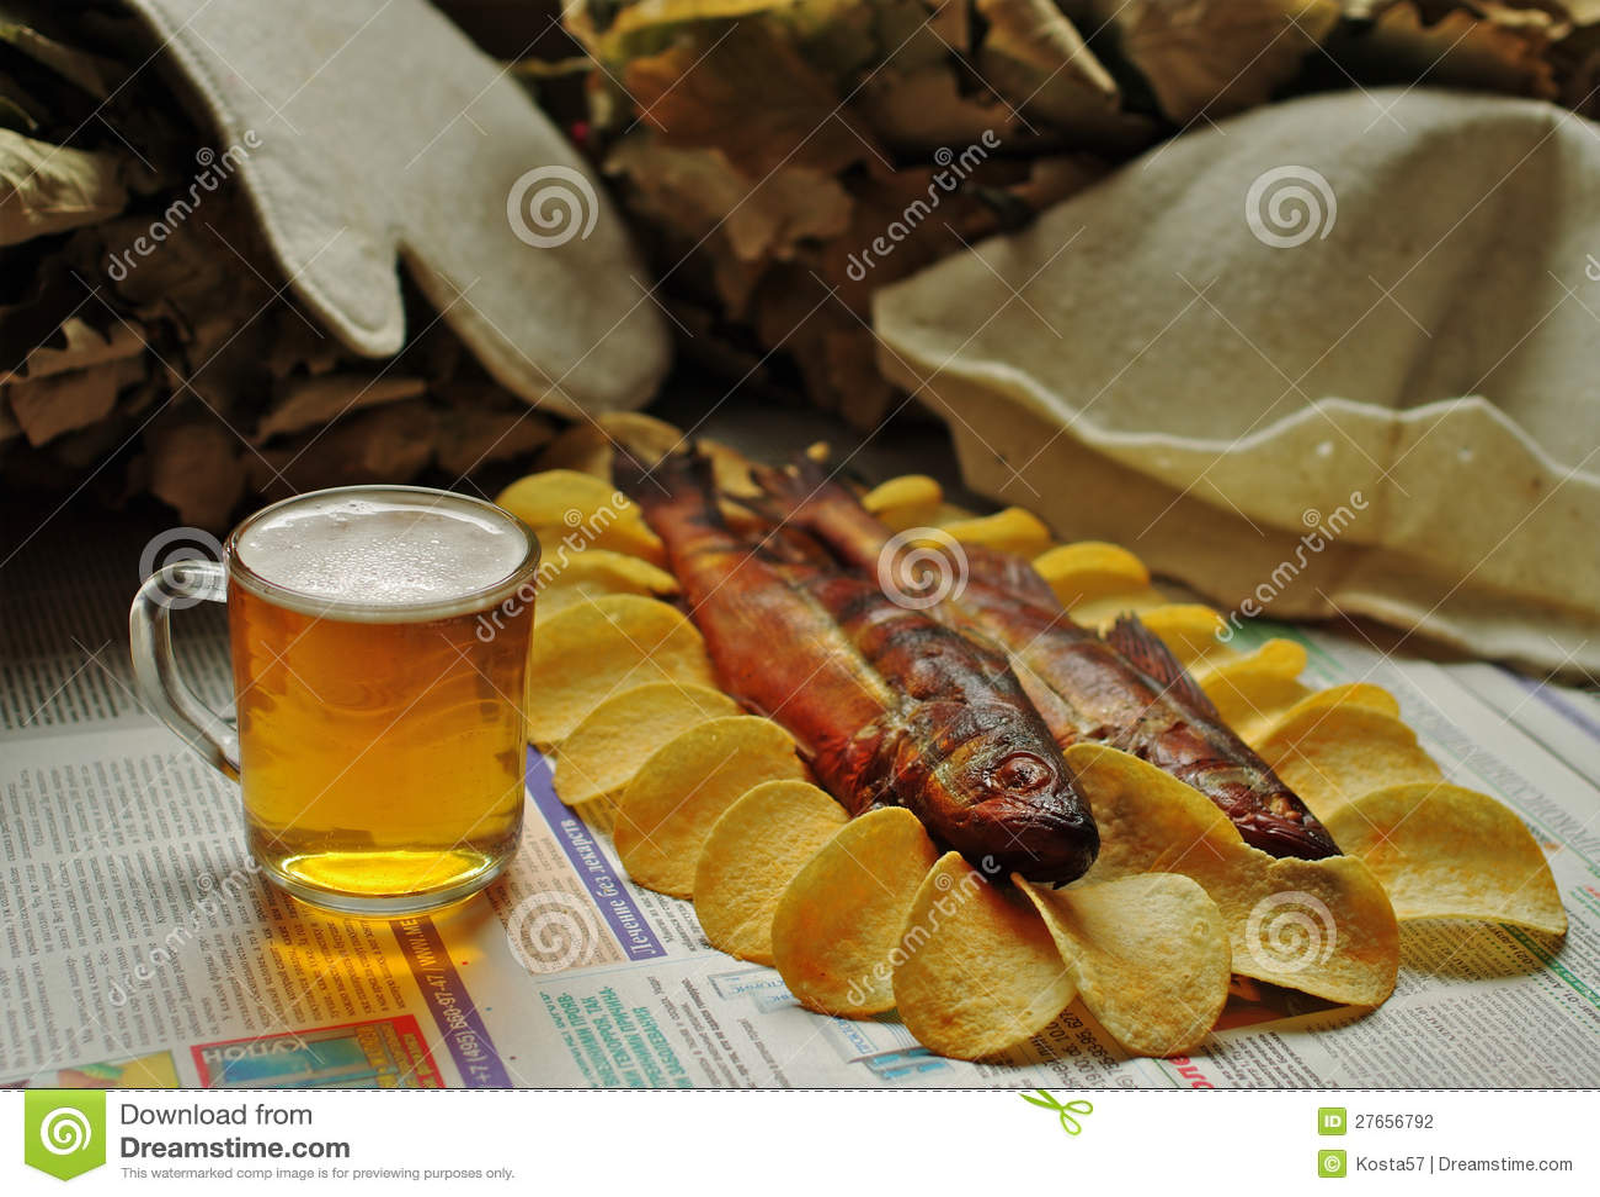 Hairdryer - cerveza, pescado, virutas